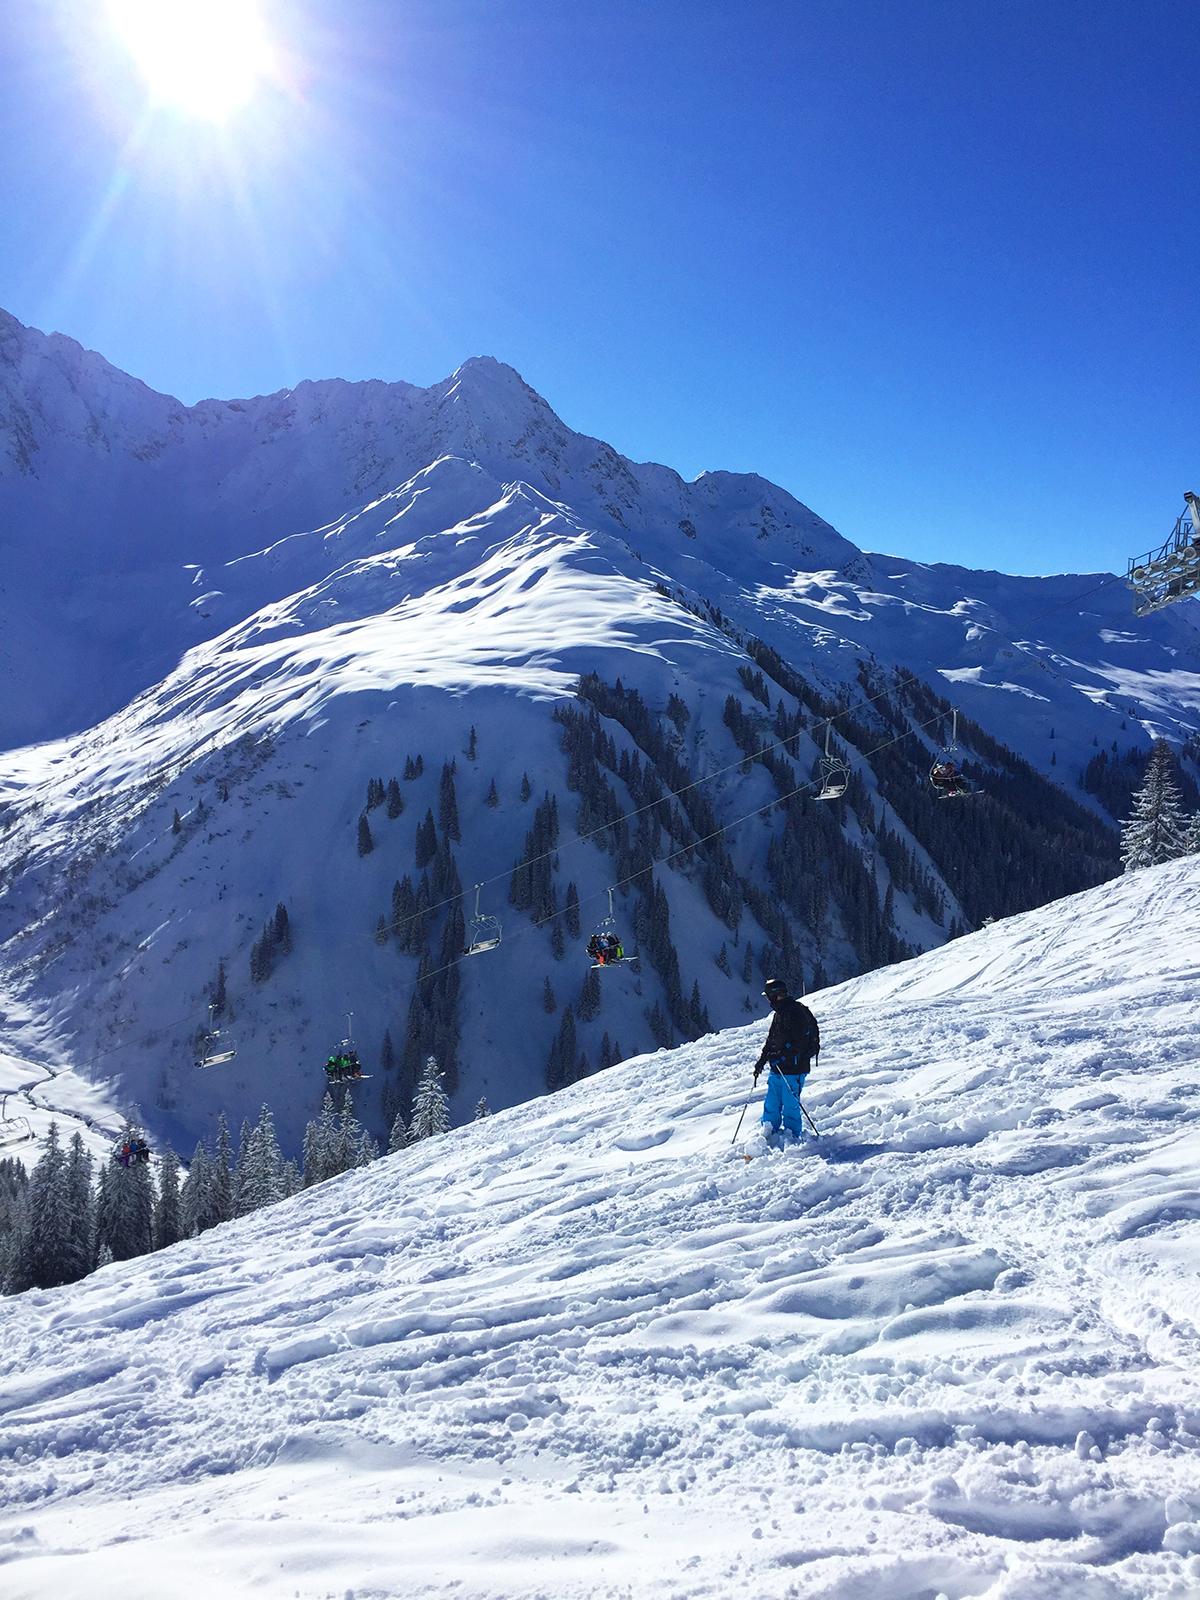 skiing-powder-sonnenkopf-austria